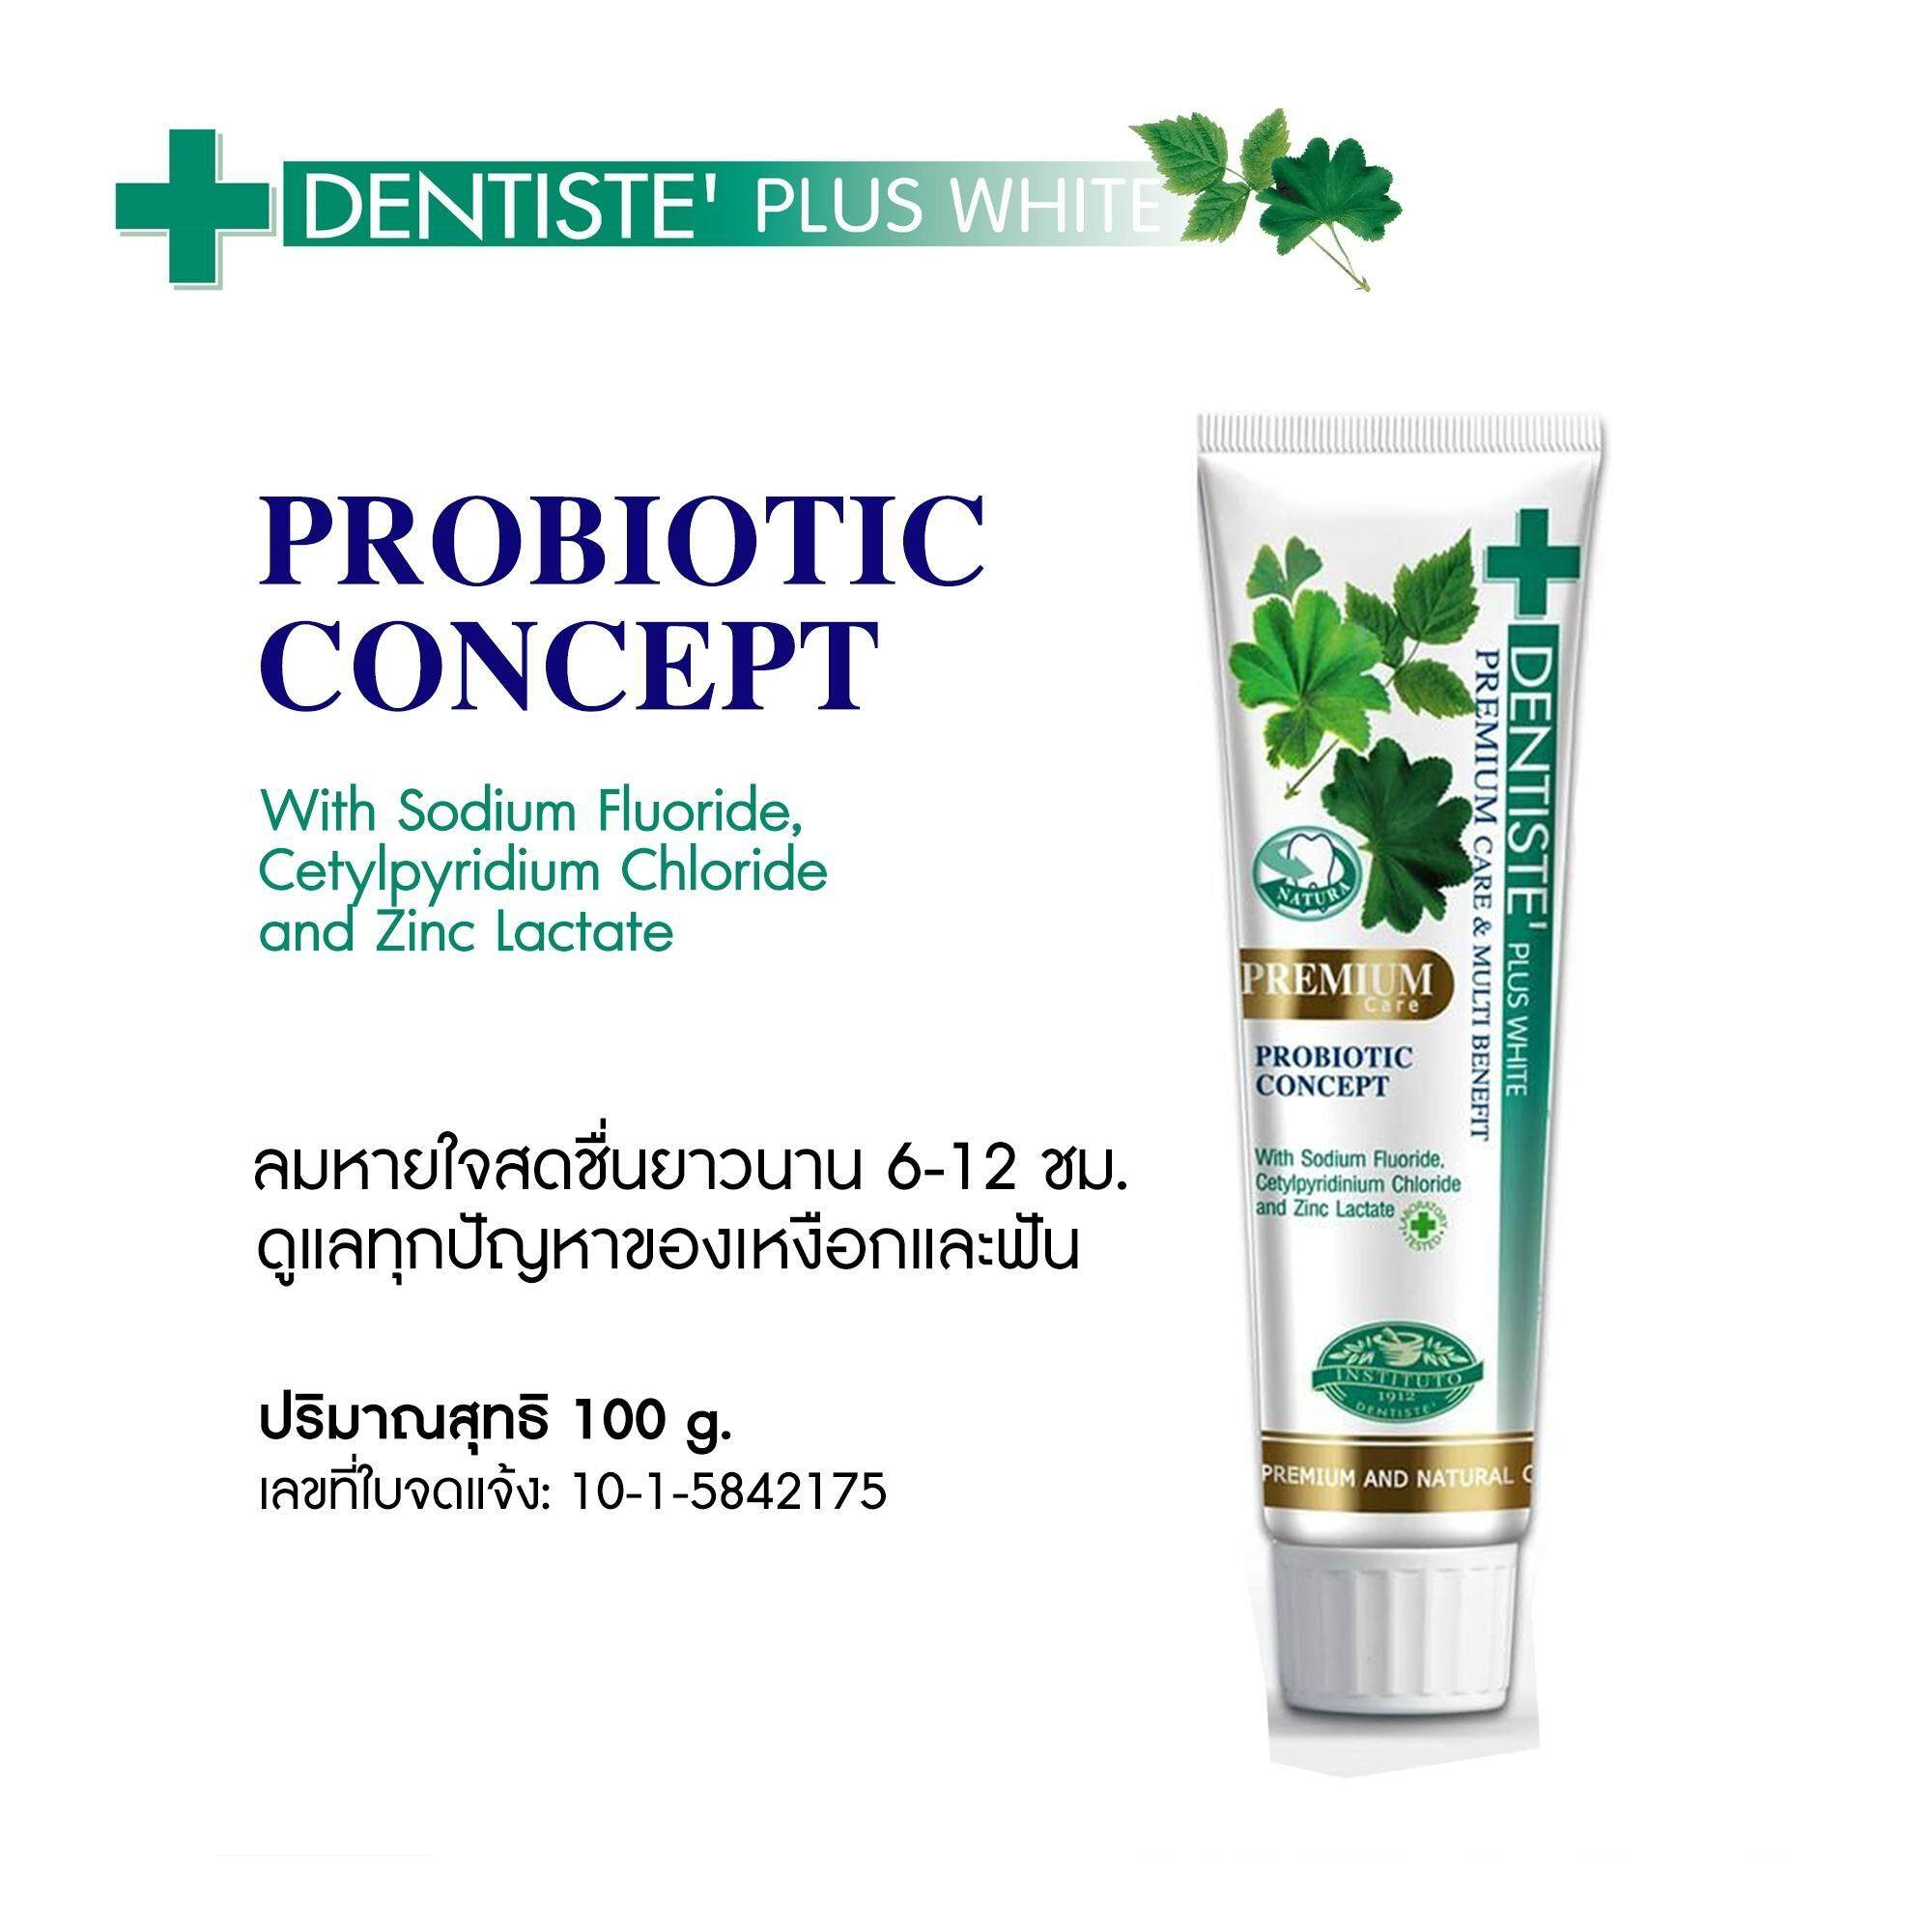 Dentiste' Premium Care toothpaste 100g. สูตรพรีเมี่ยมแคร์